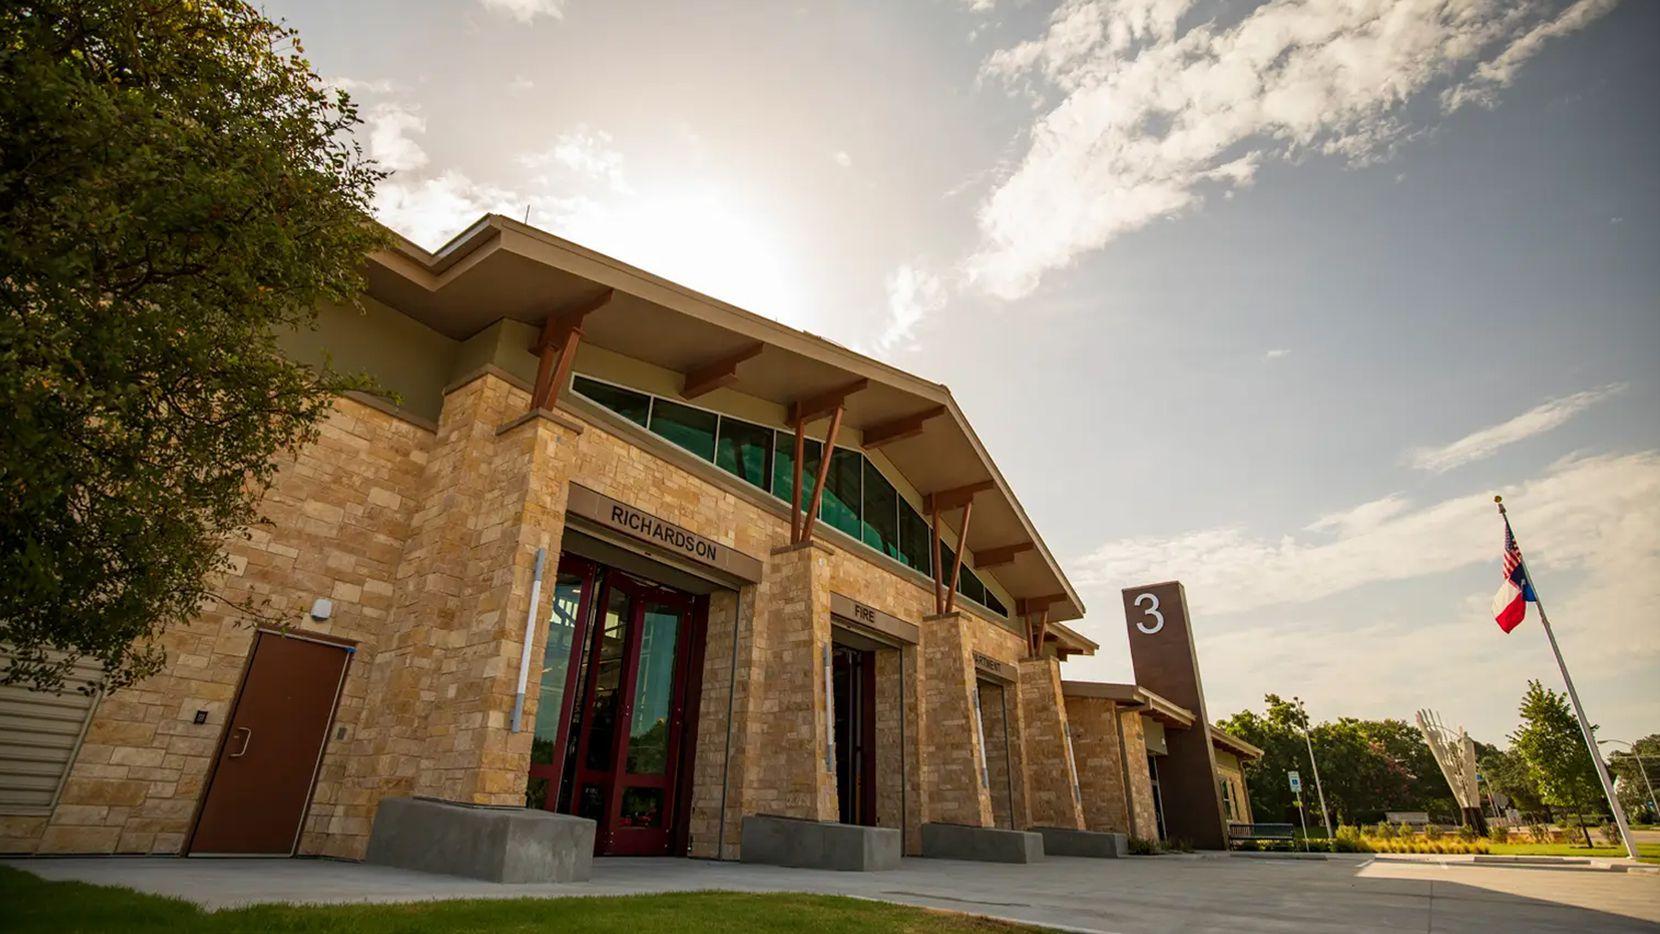 Richardson's new Fire Station 3